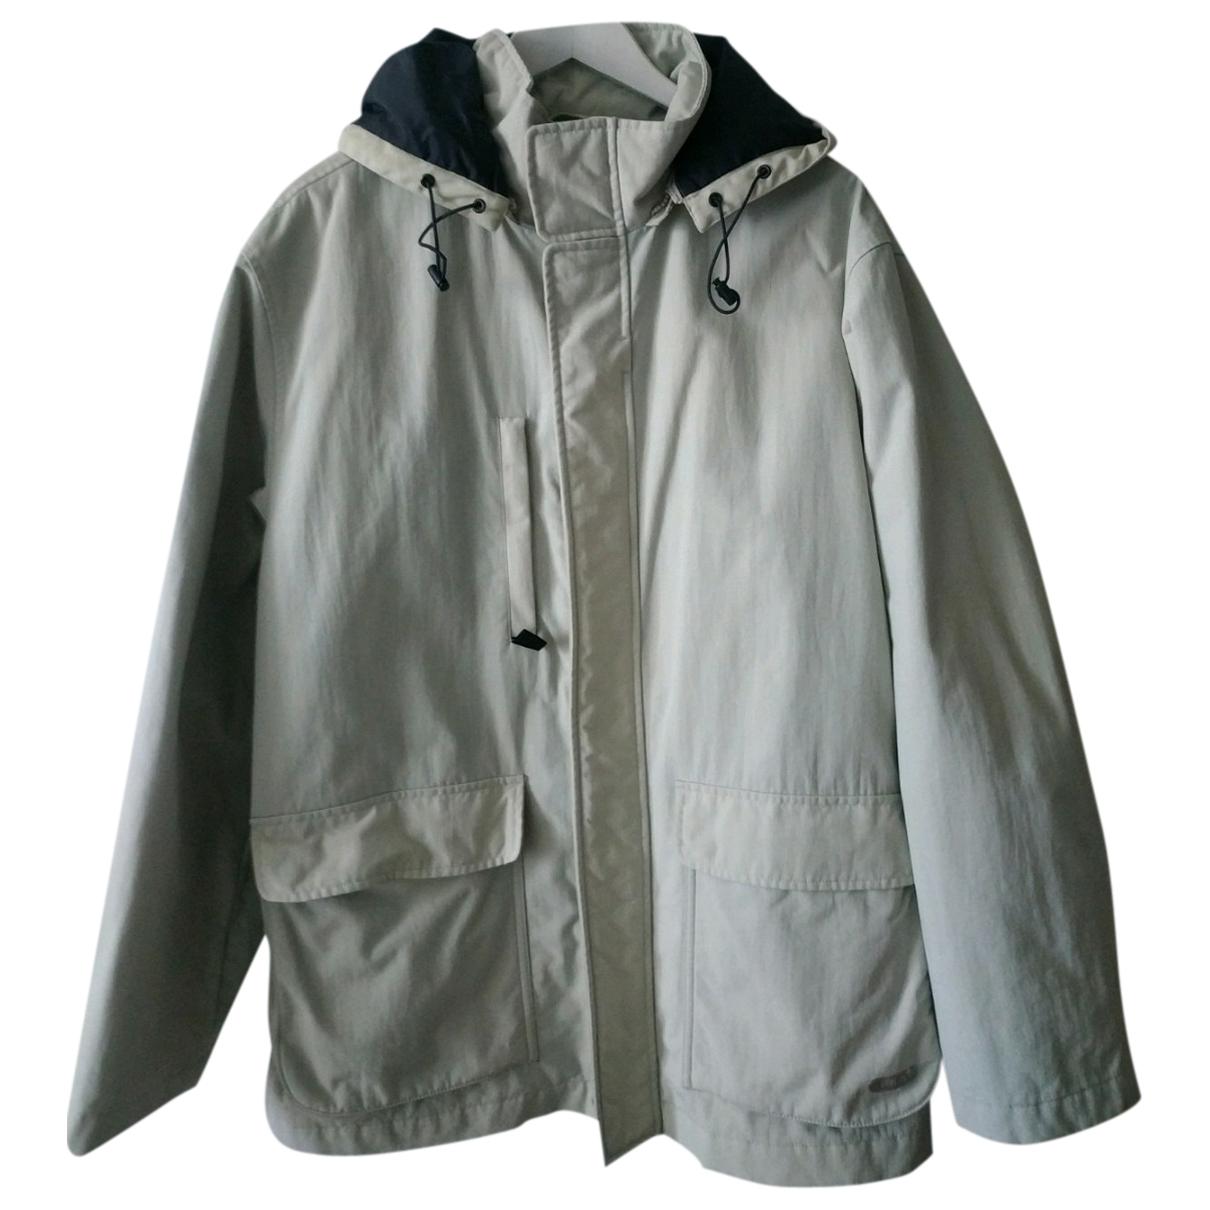 Fila \N Grey jacket  for Men S International